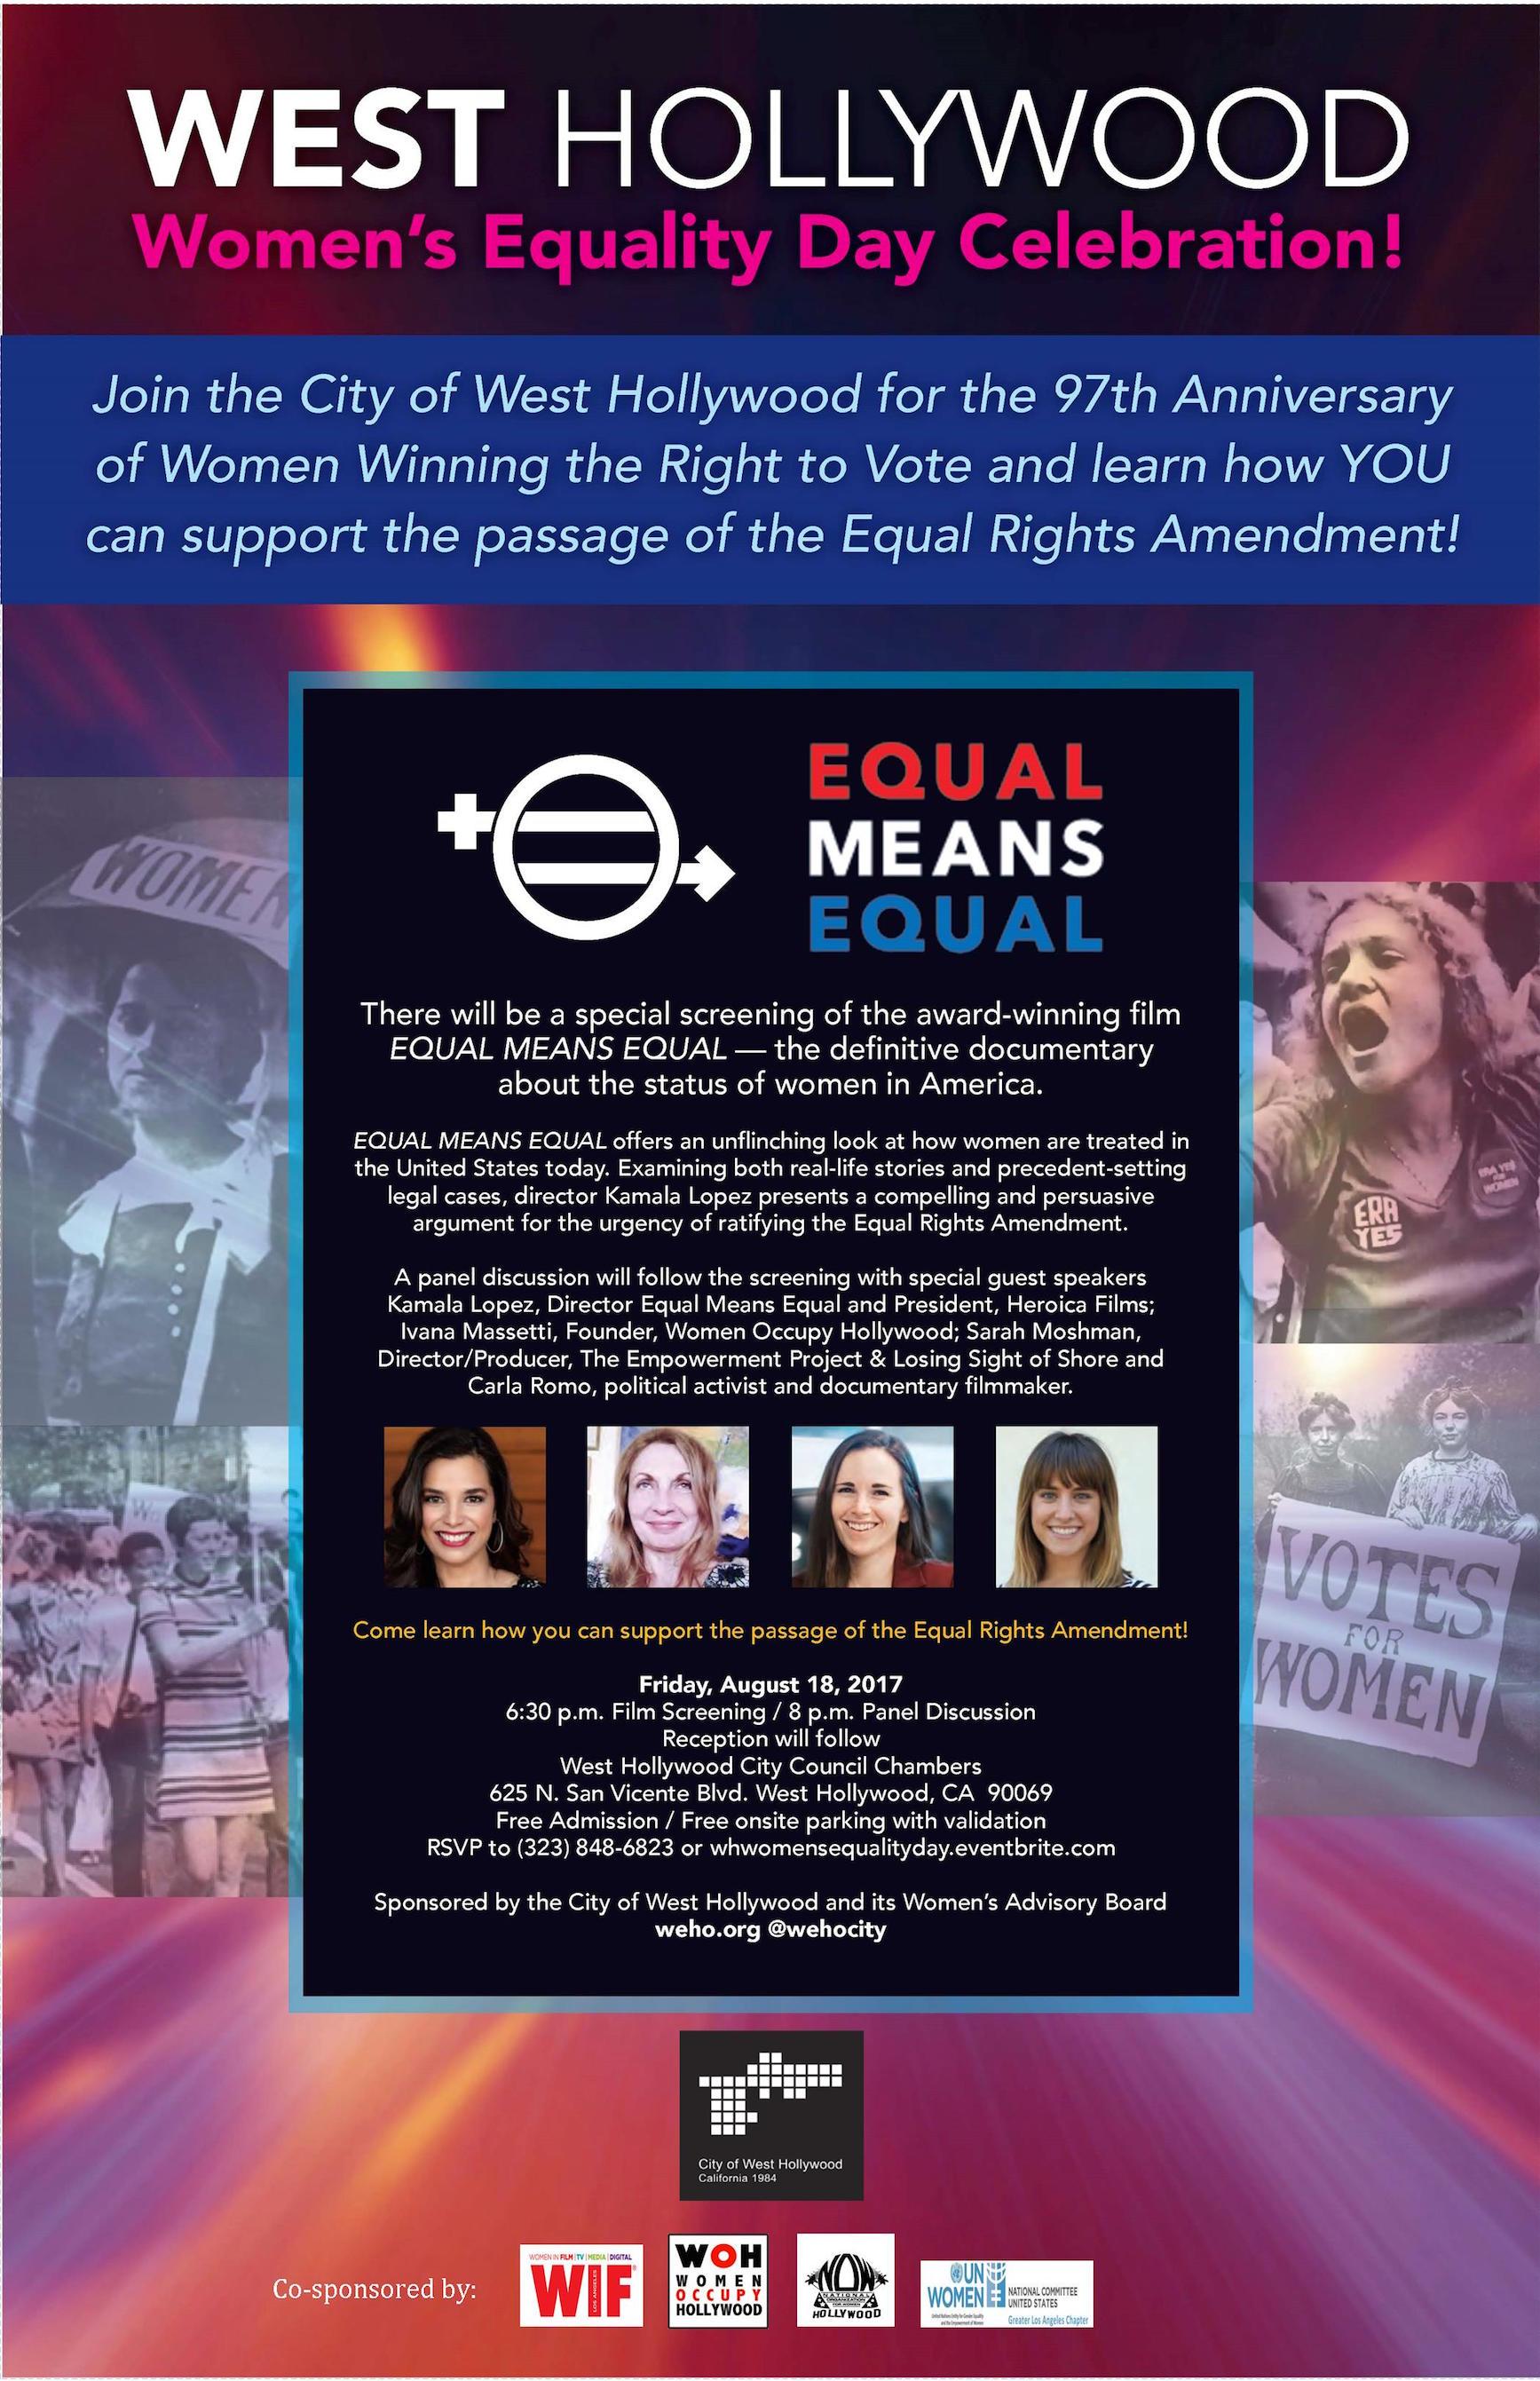 Women's Equality Day Flyer - Digital copy